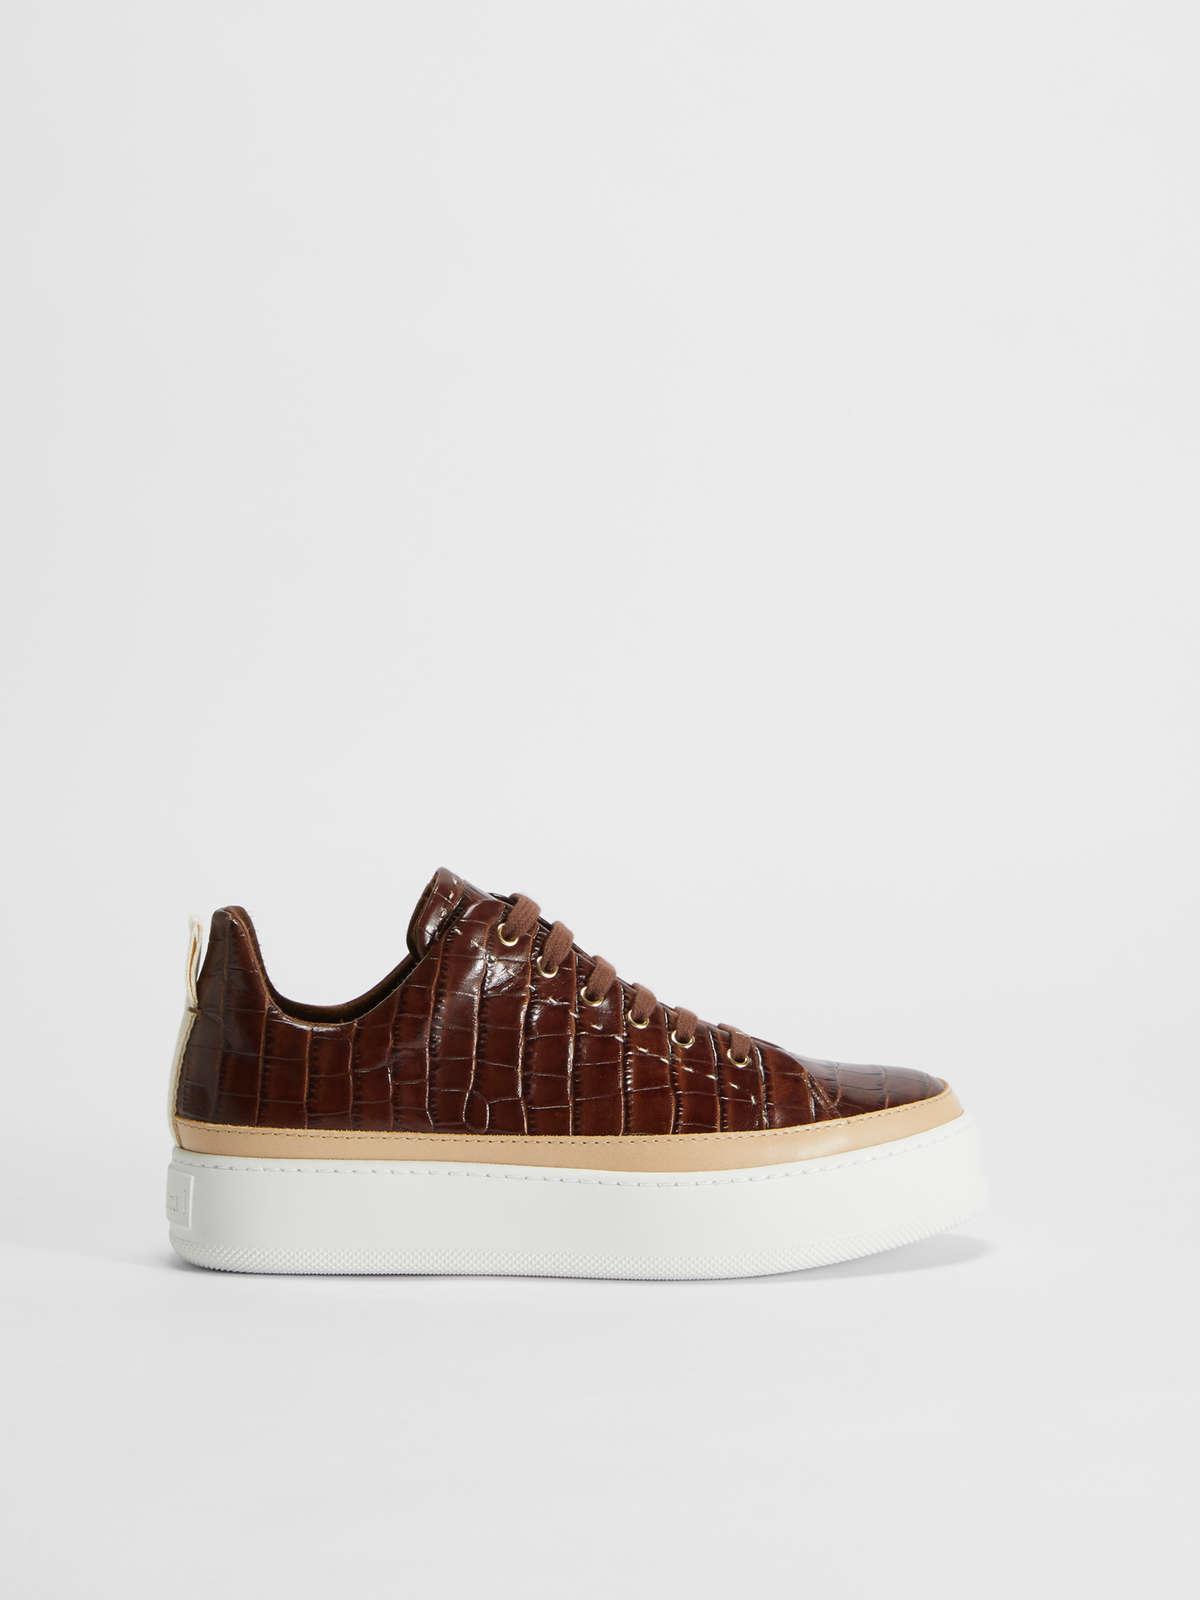 Crocodile print leather sneaker - Max Mara